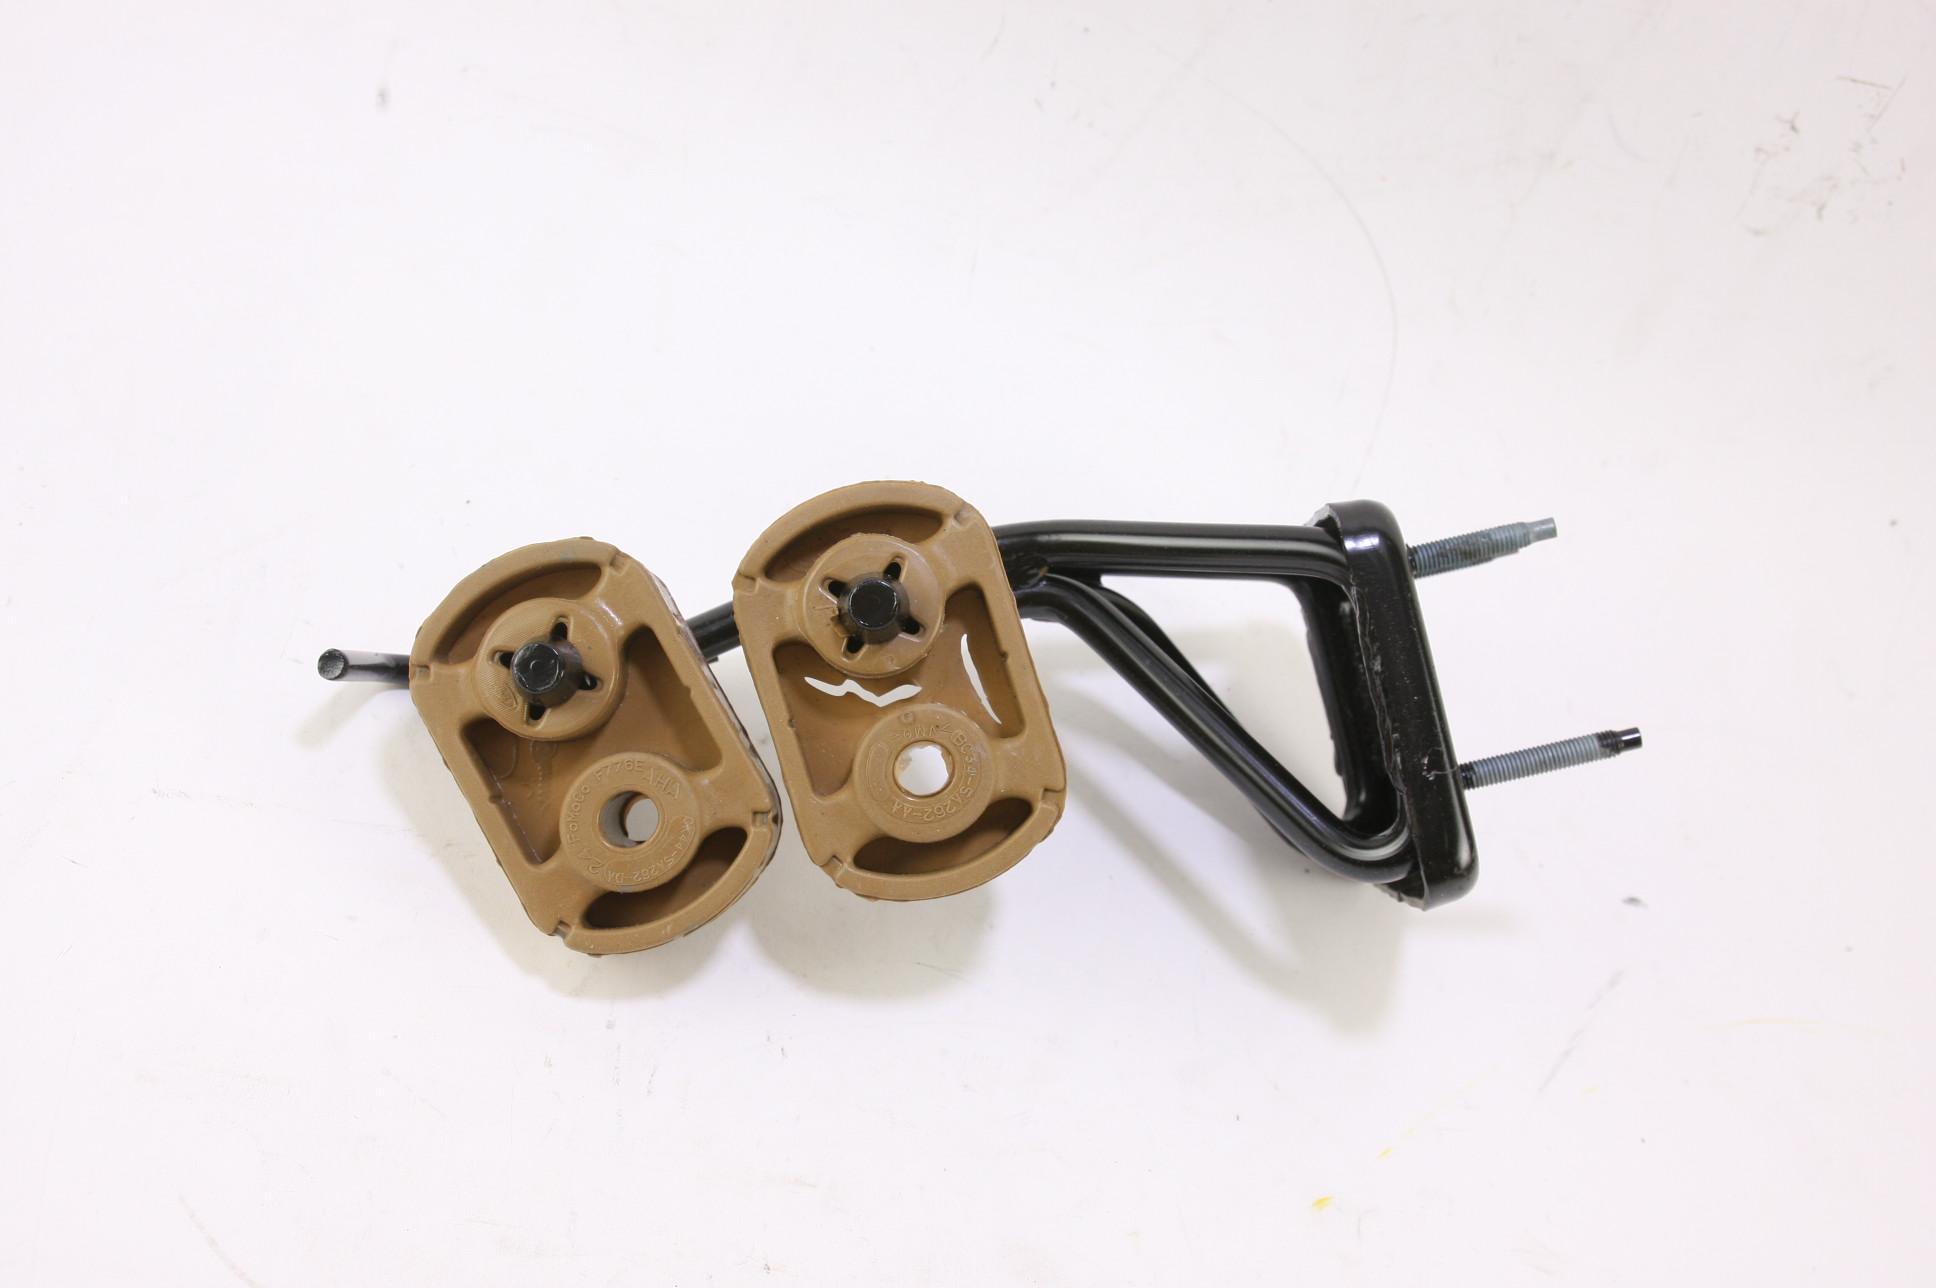 *** New OEM BC3Z5A242U Ford 11-16 Bracket Hanger Fast Free Shipping NIP - image 1